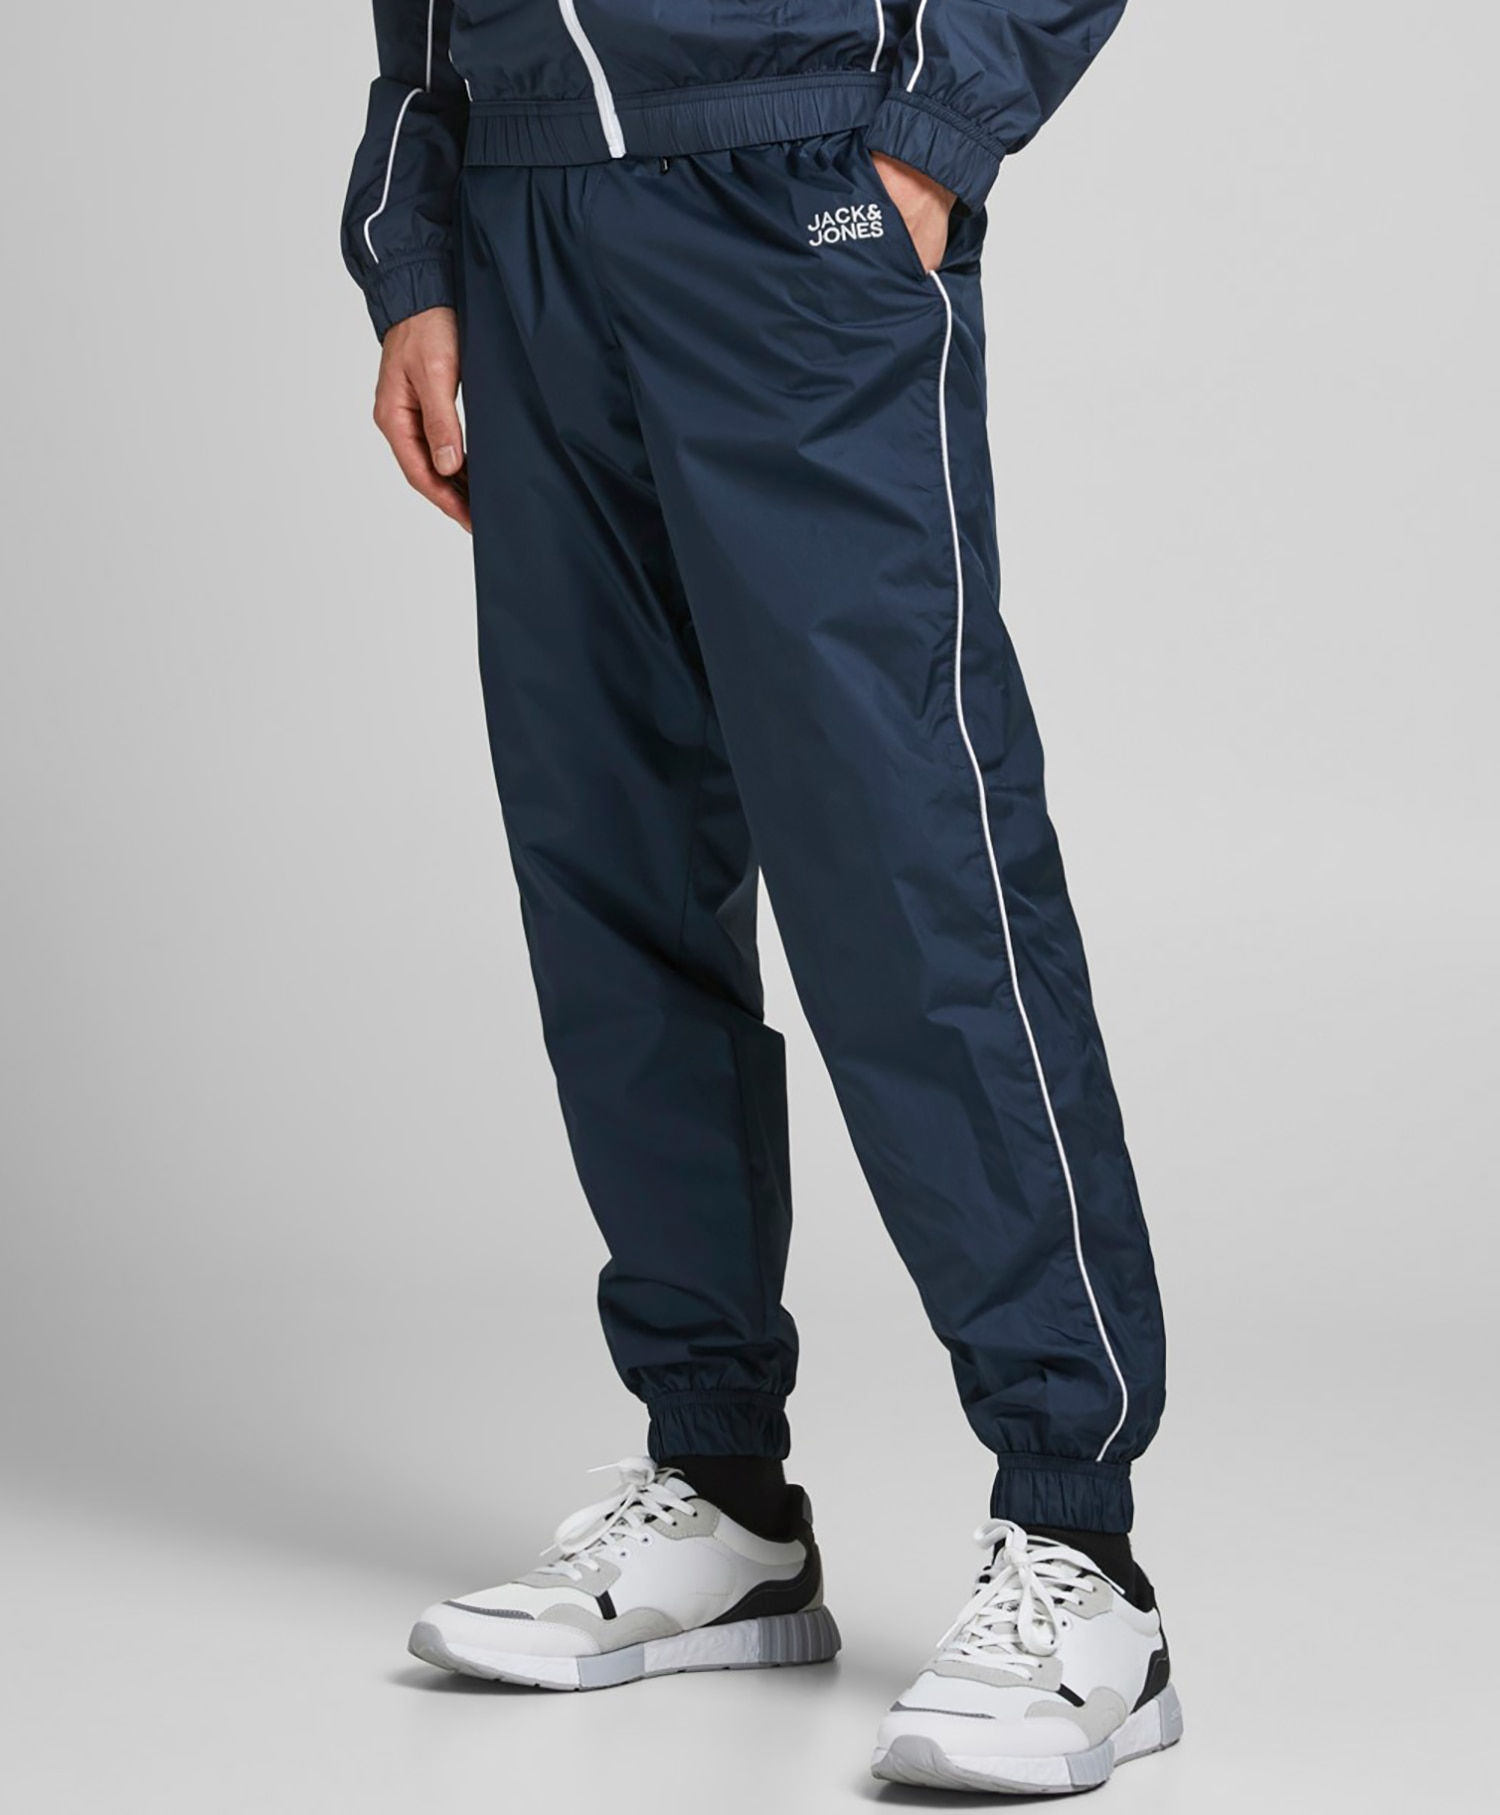 Jack&Jones Pippen track pants